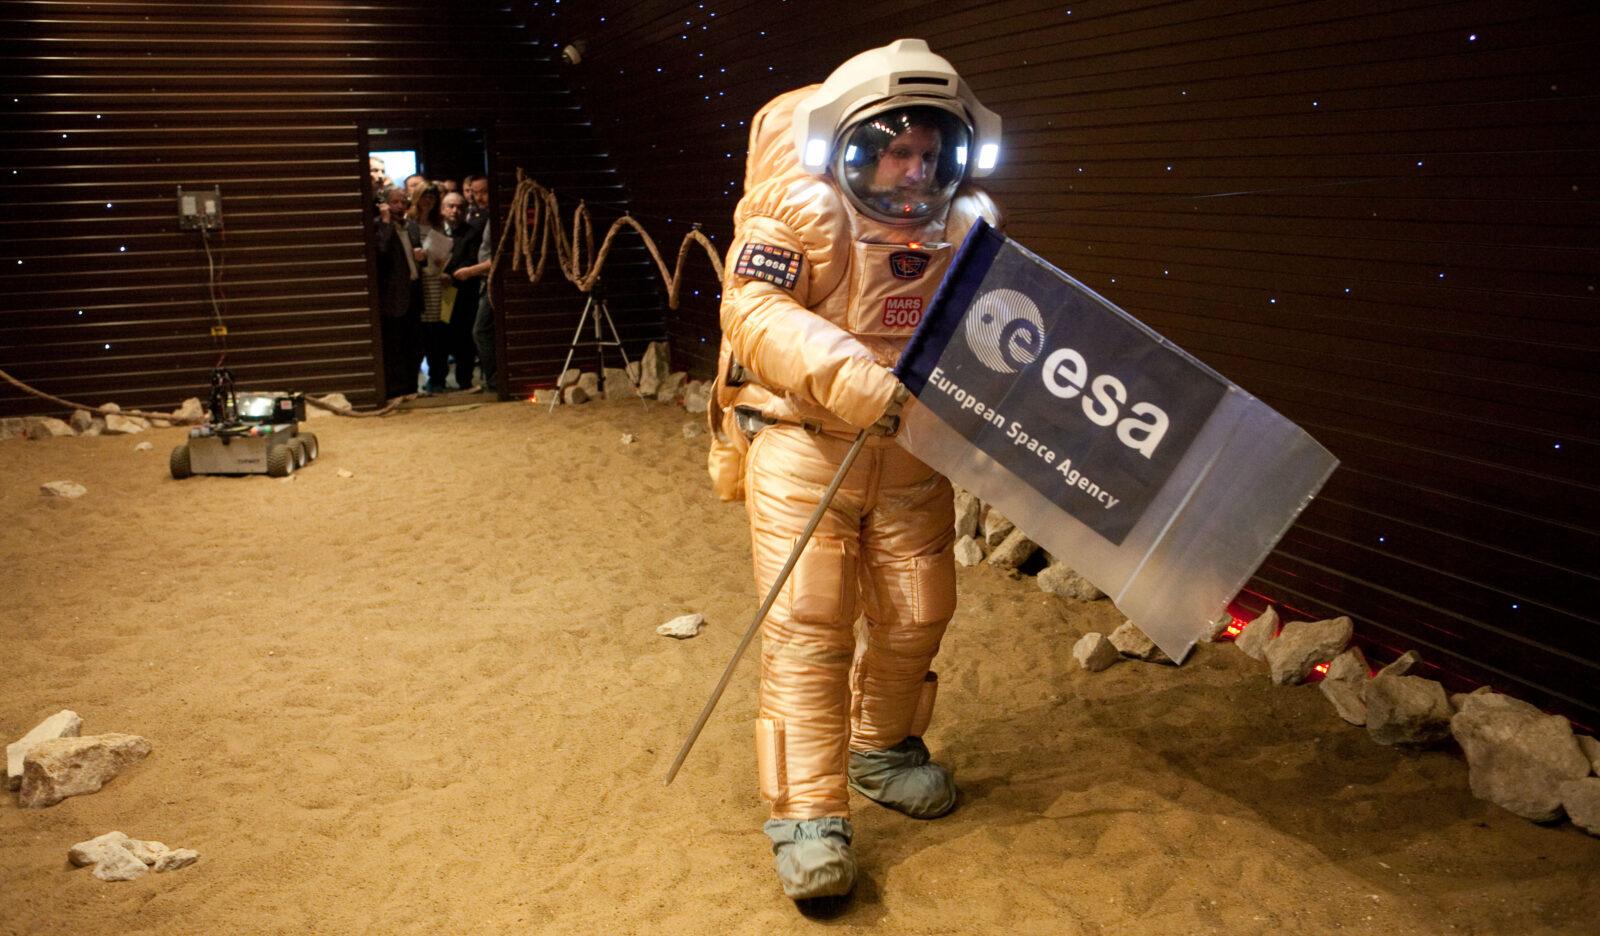 A study participant on a mock planet